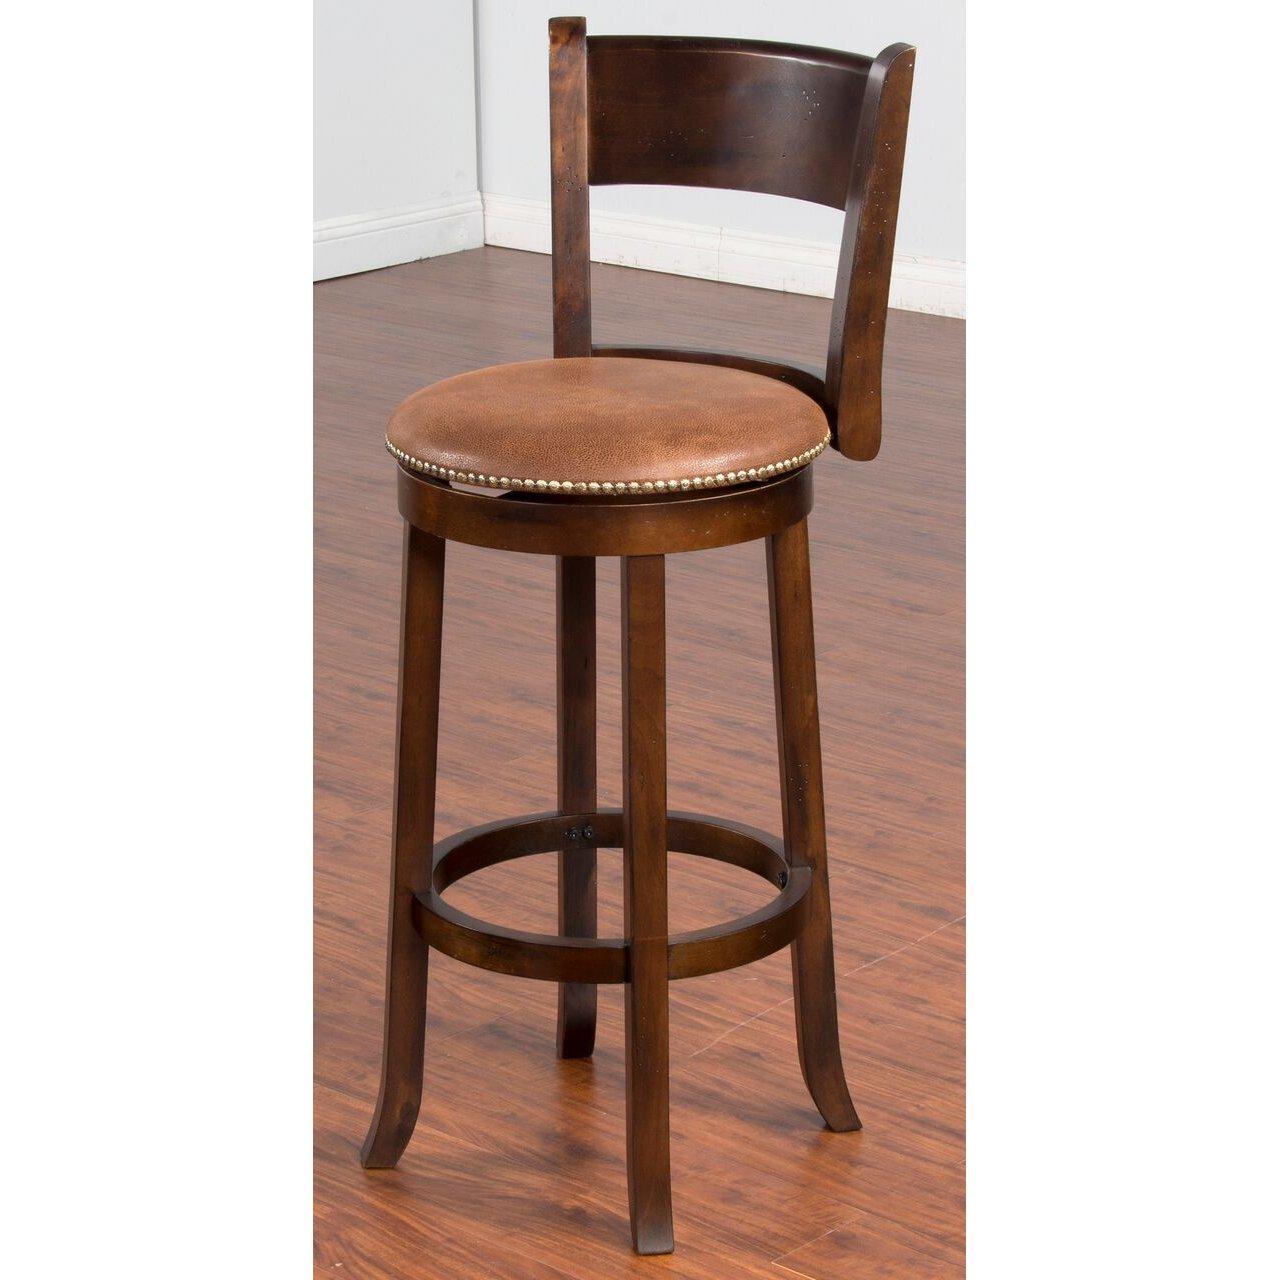 Brown 30 Inch Swivel Bar Stool Santa Fe Bar Stools 30 Inch Bar Stools Bar Stools With Backs Bar stools 30 inch